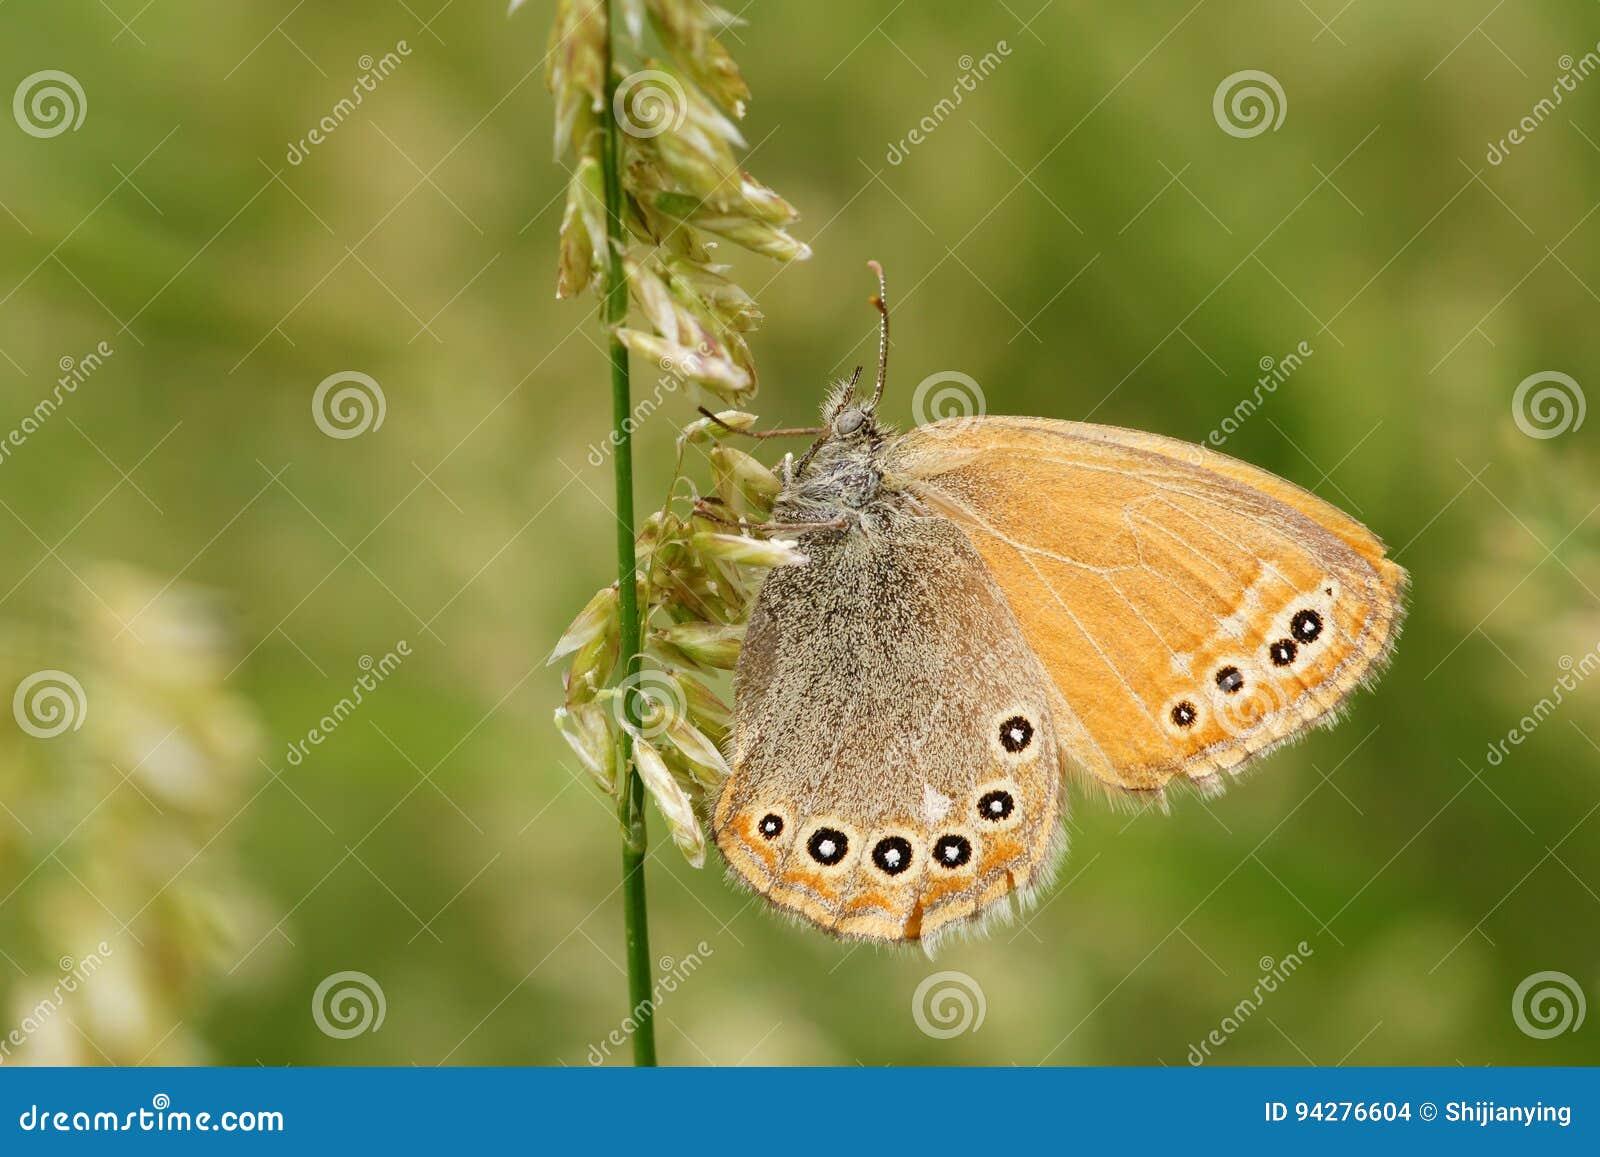 Nymphalidaevlinder